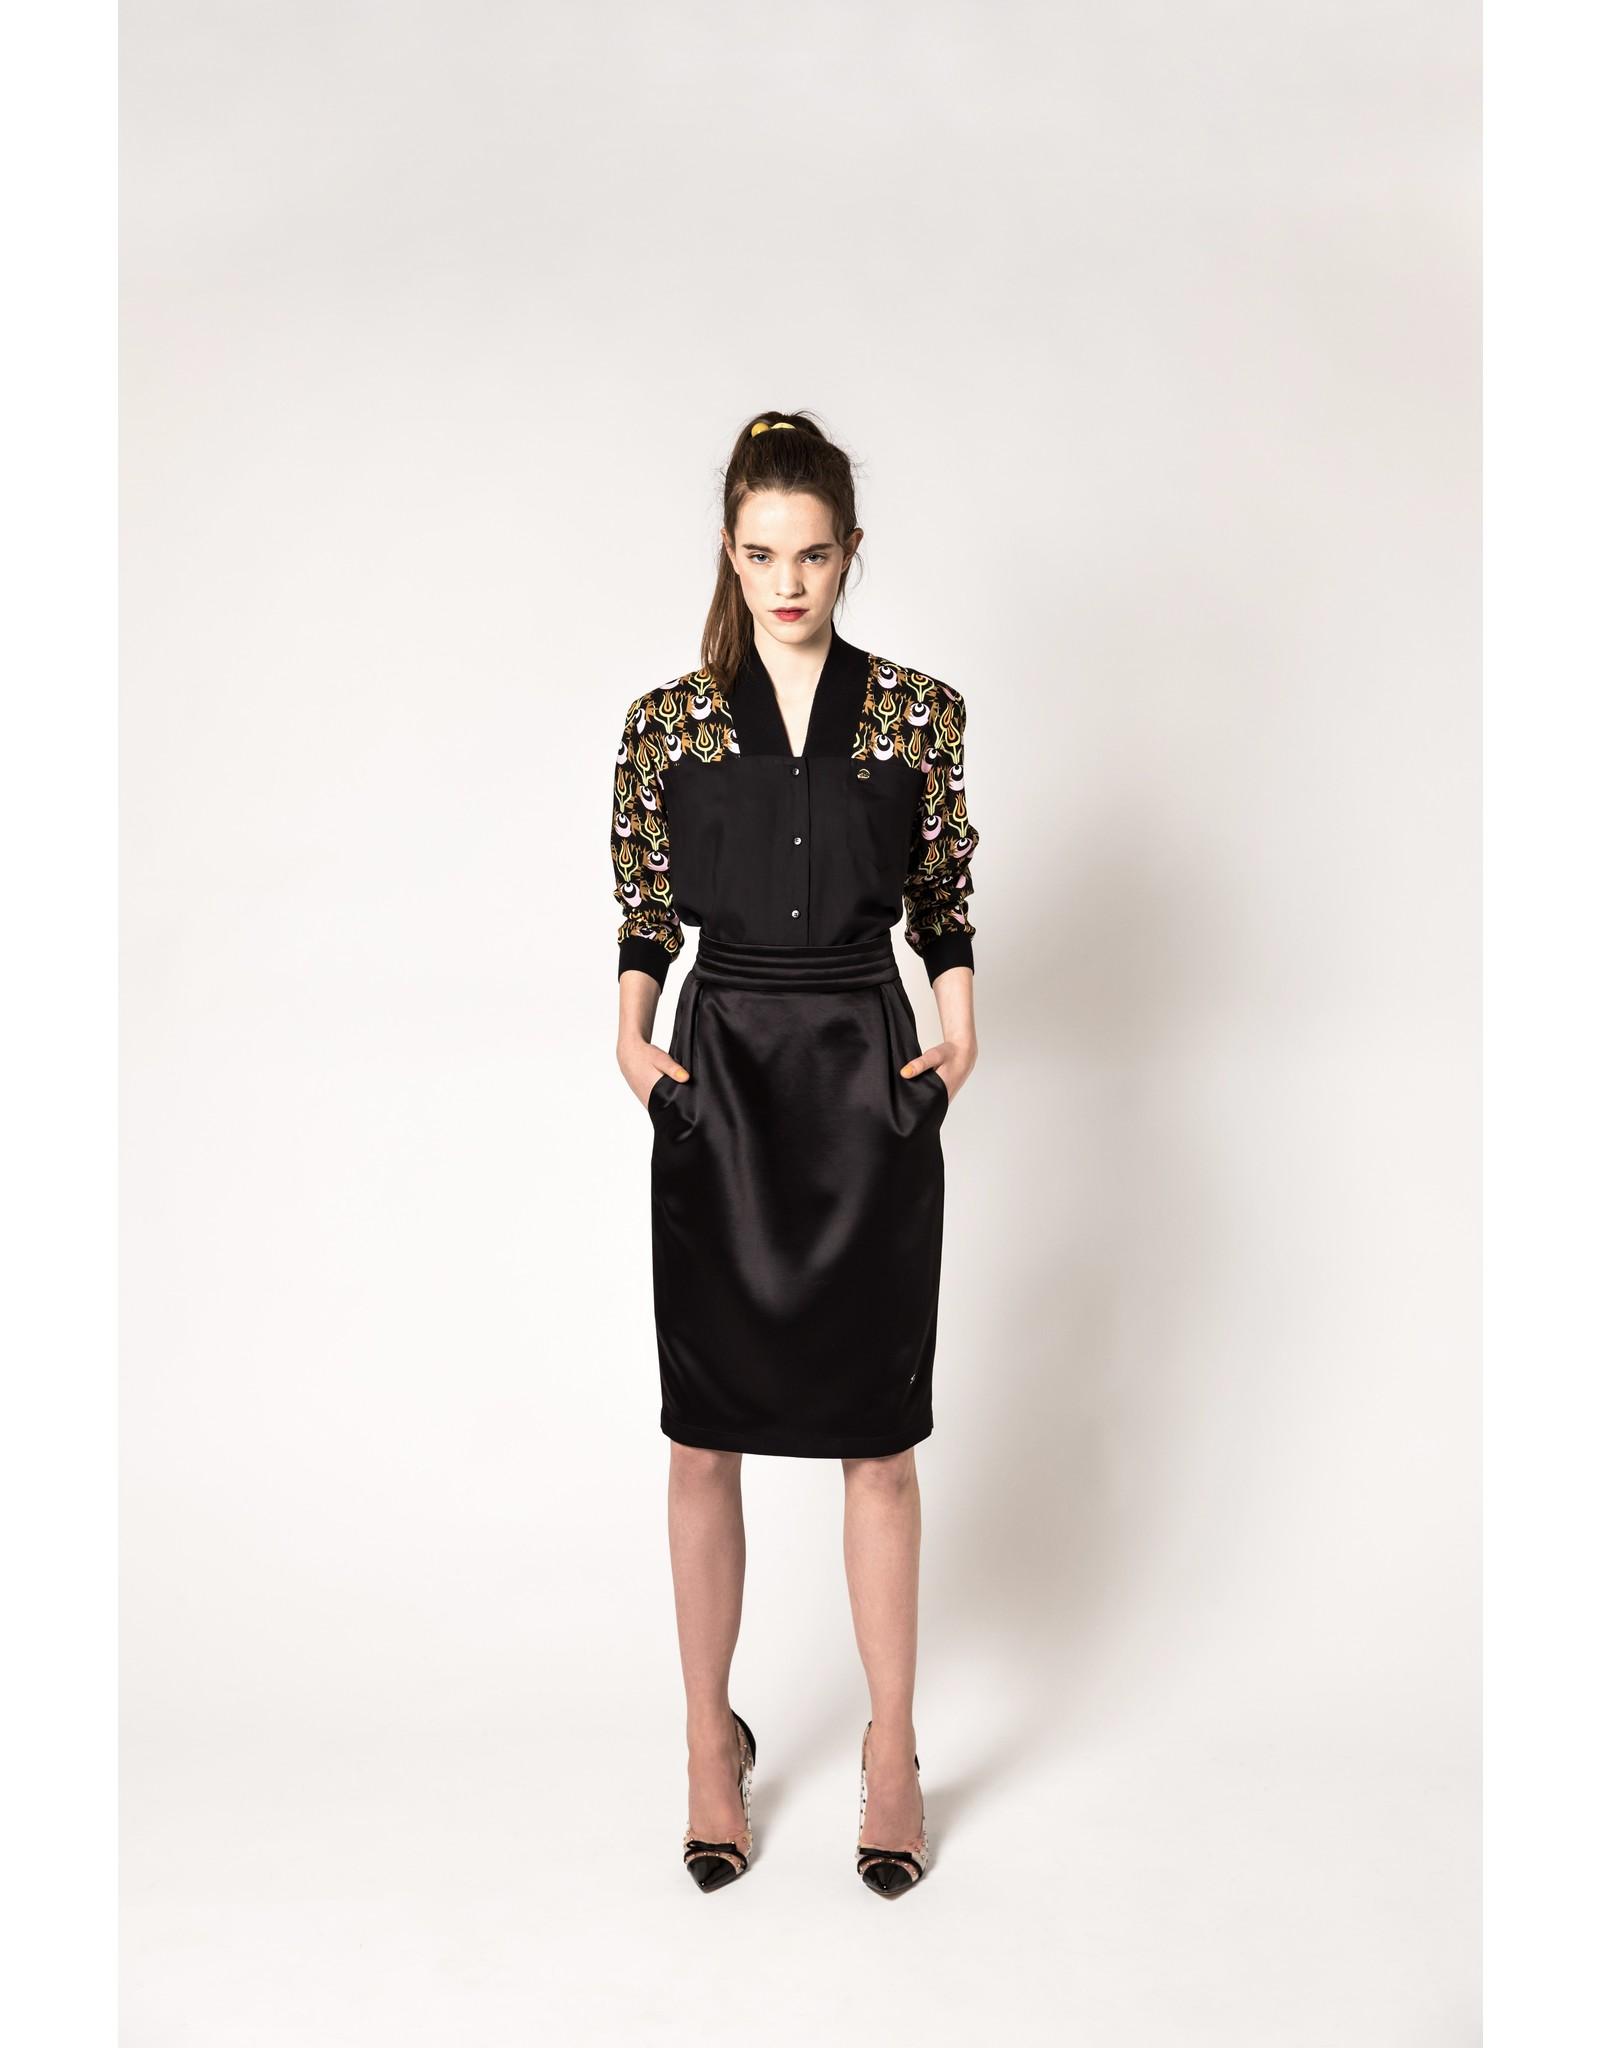 AW1920 323-AE Padded Waist Skirt